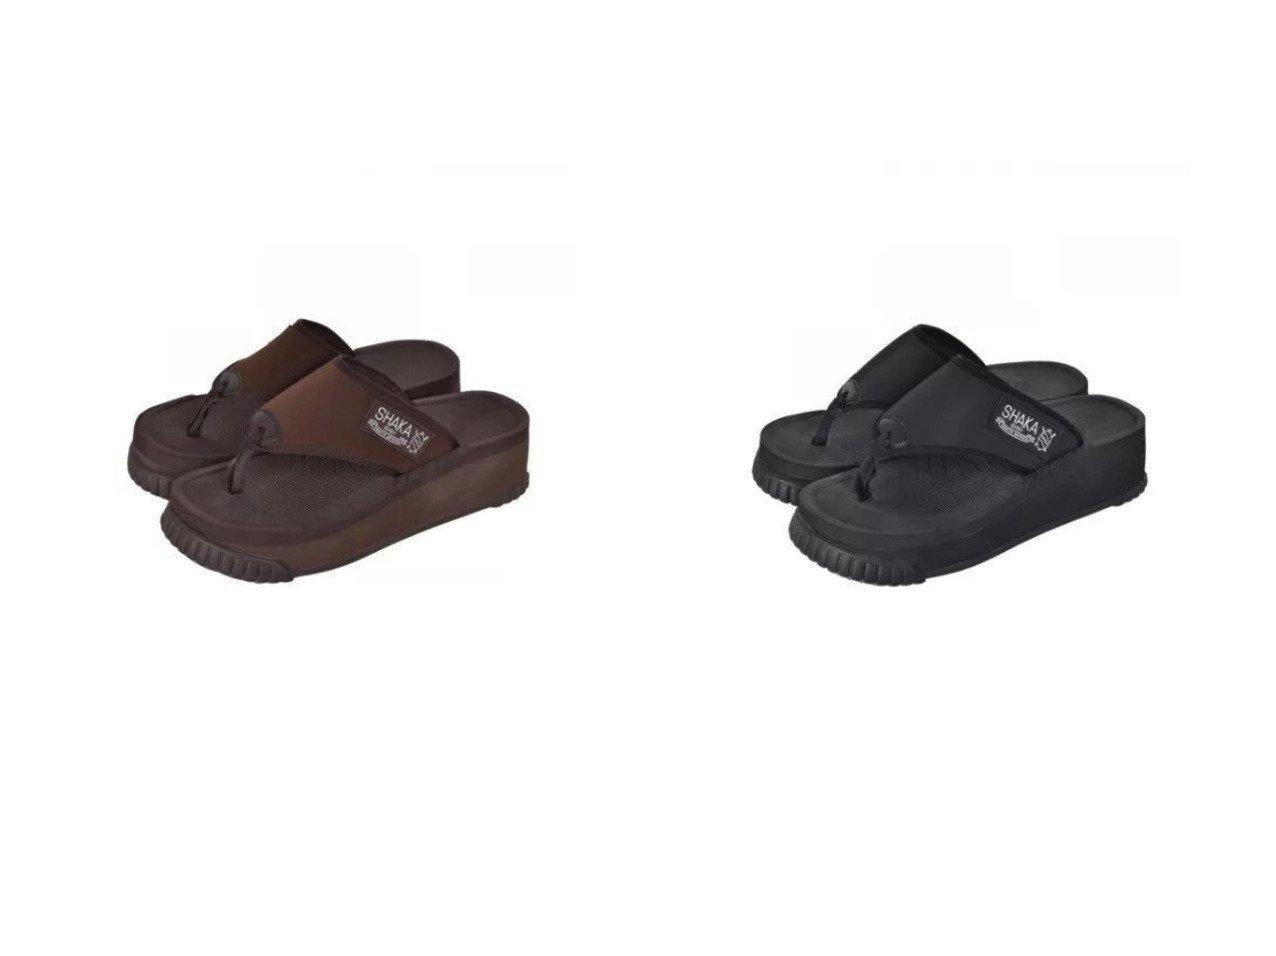 【G.V.G.V./ジーヴィージーヴィ】の【SHAKA G.V.G.V.】STINGRAY PLATFORM 【シューズ・靴】おすすめ!人気、トレンド・レディースファッションの通販 おすすめで人気の流行・トレンド、ファッションの通販商品 インテリア・家具・メンズファッション・キッズファッション・レディースファッション・服の通販 founy(ファニー) https://founy.com/ ファッション Fashion レディースファッション WOMEN 厚底 クッション サンダル シューズ スペシャル 2021年 2021 S/S・春夏 SS・Spring/Summer 2021春夏・S/S SS/Spring/Summer/2021 |ID:crp329100000047560